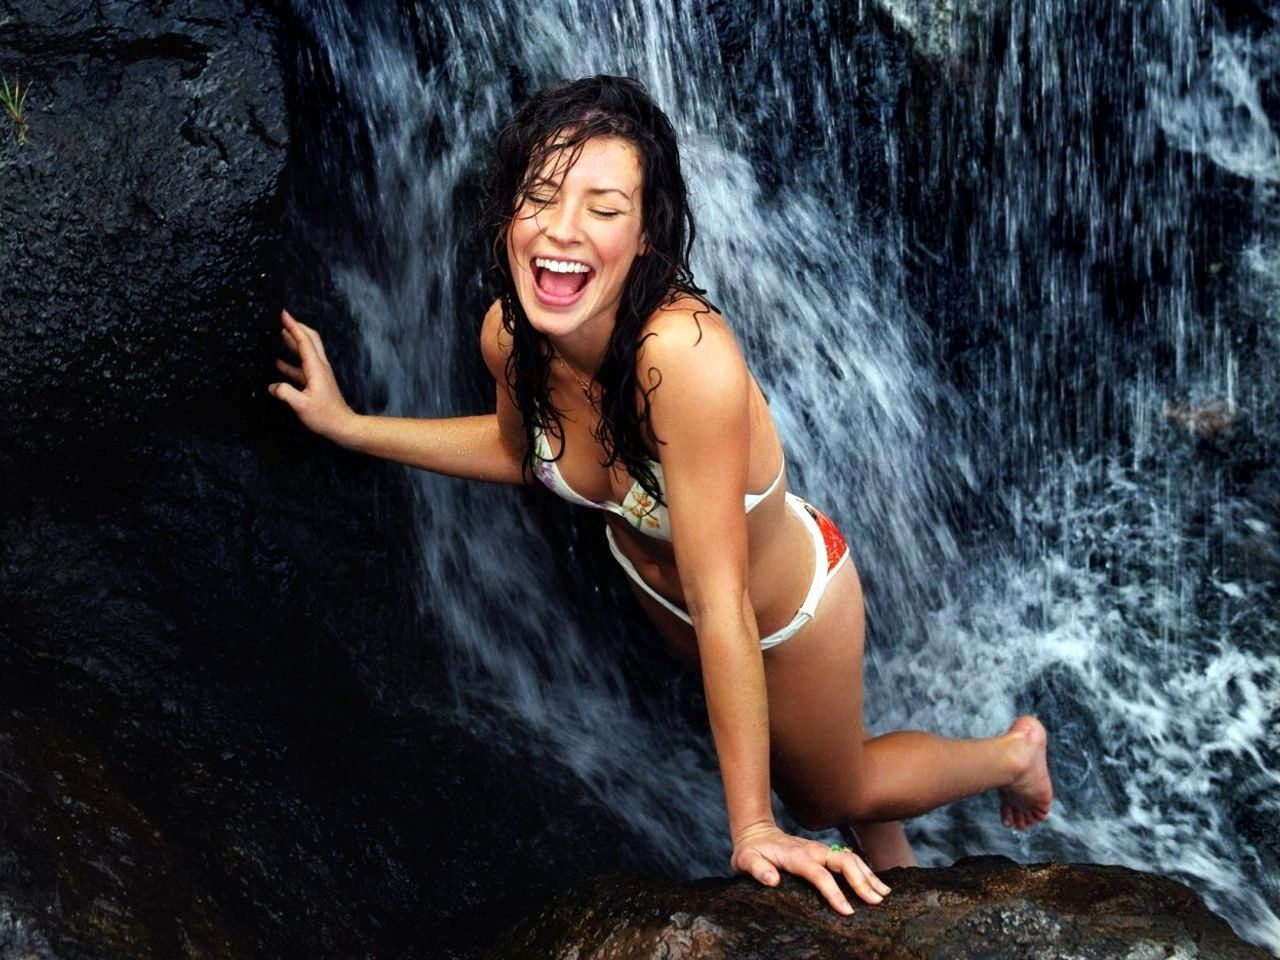 Evangeline lilly bikini slip